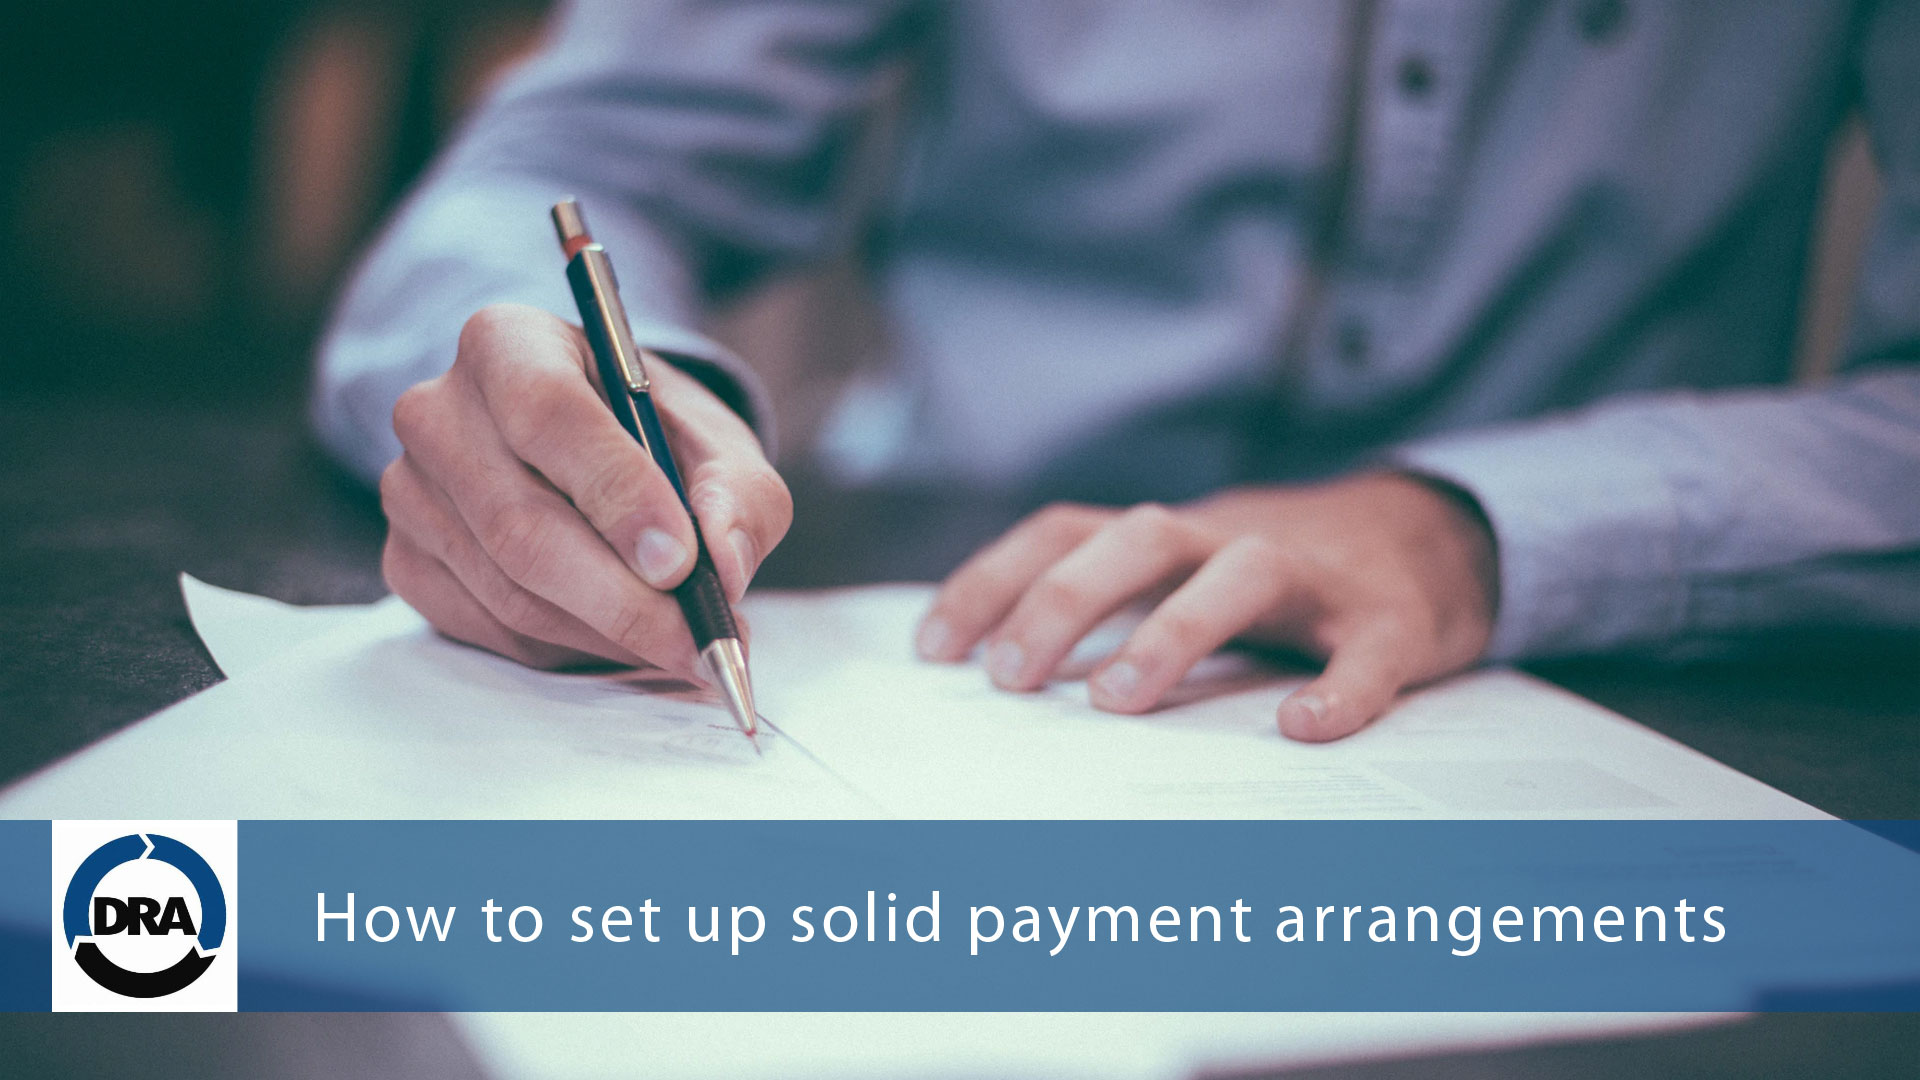 How to set up solid payment arrangements